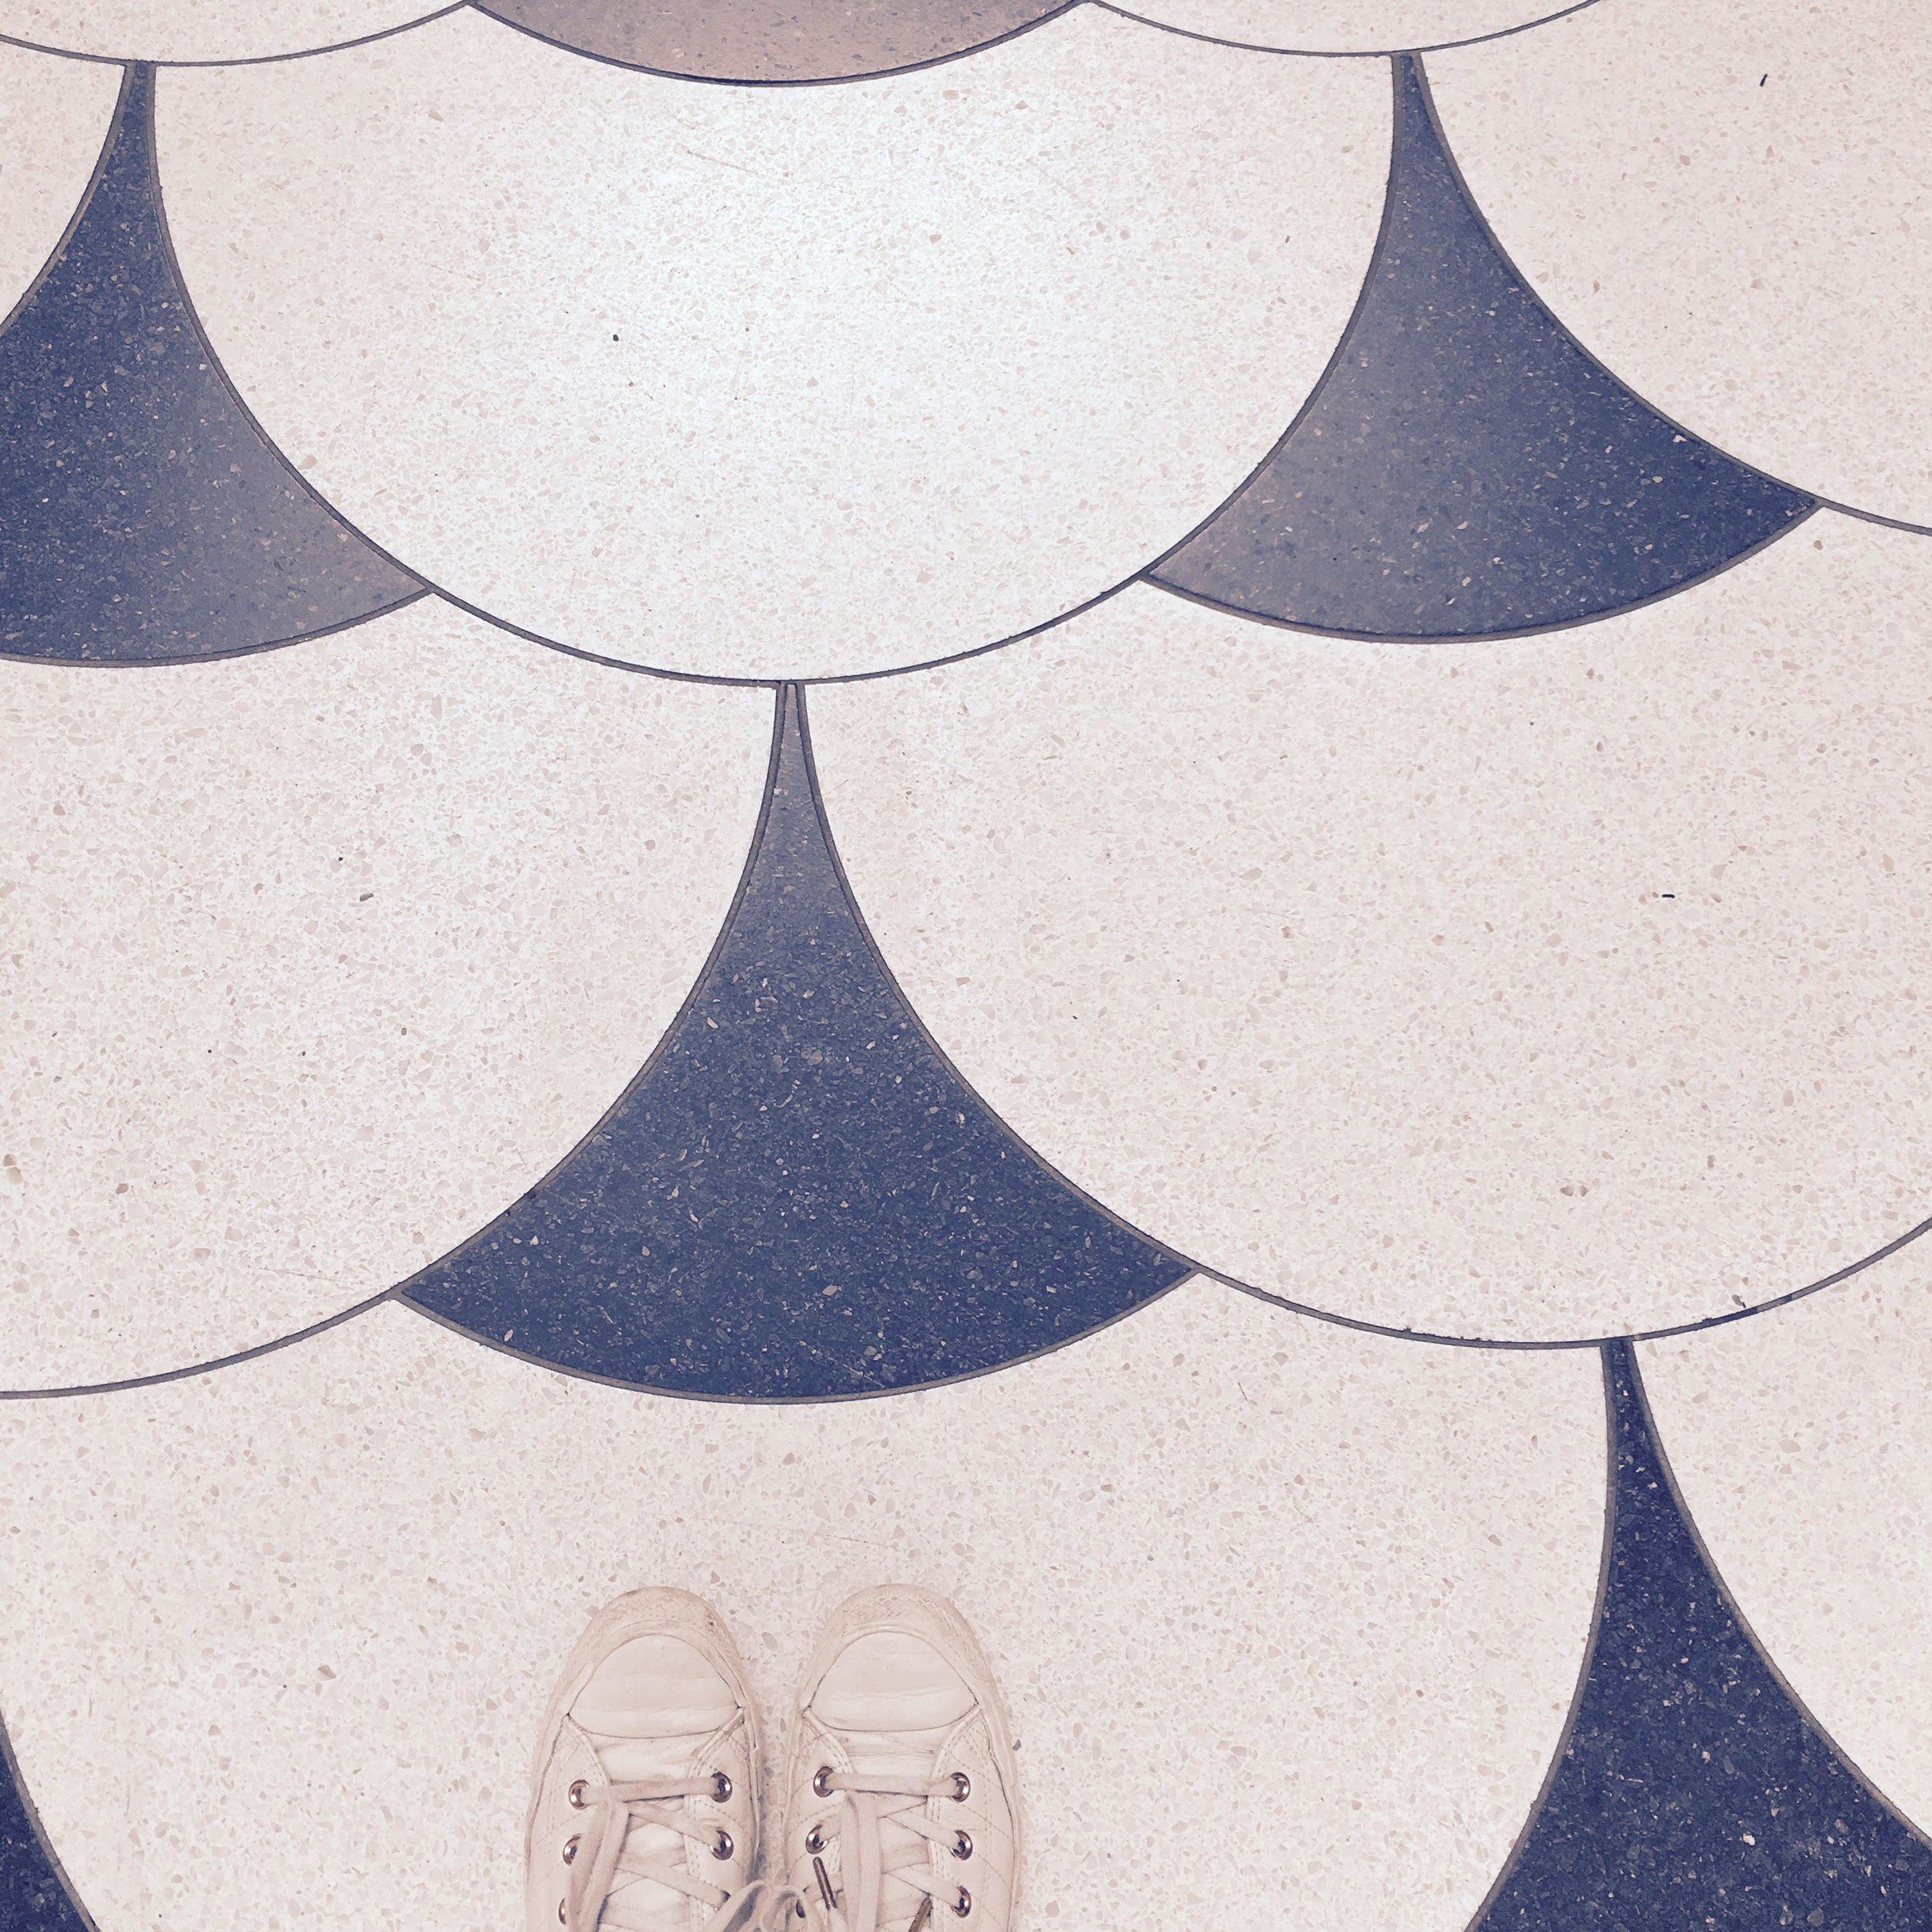 Art Deco floor tiles Converse Tate Britain London